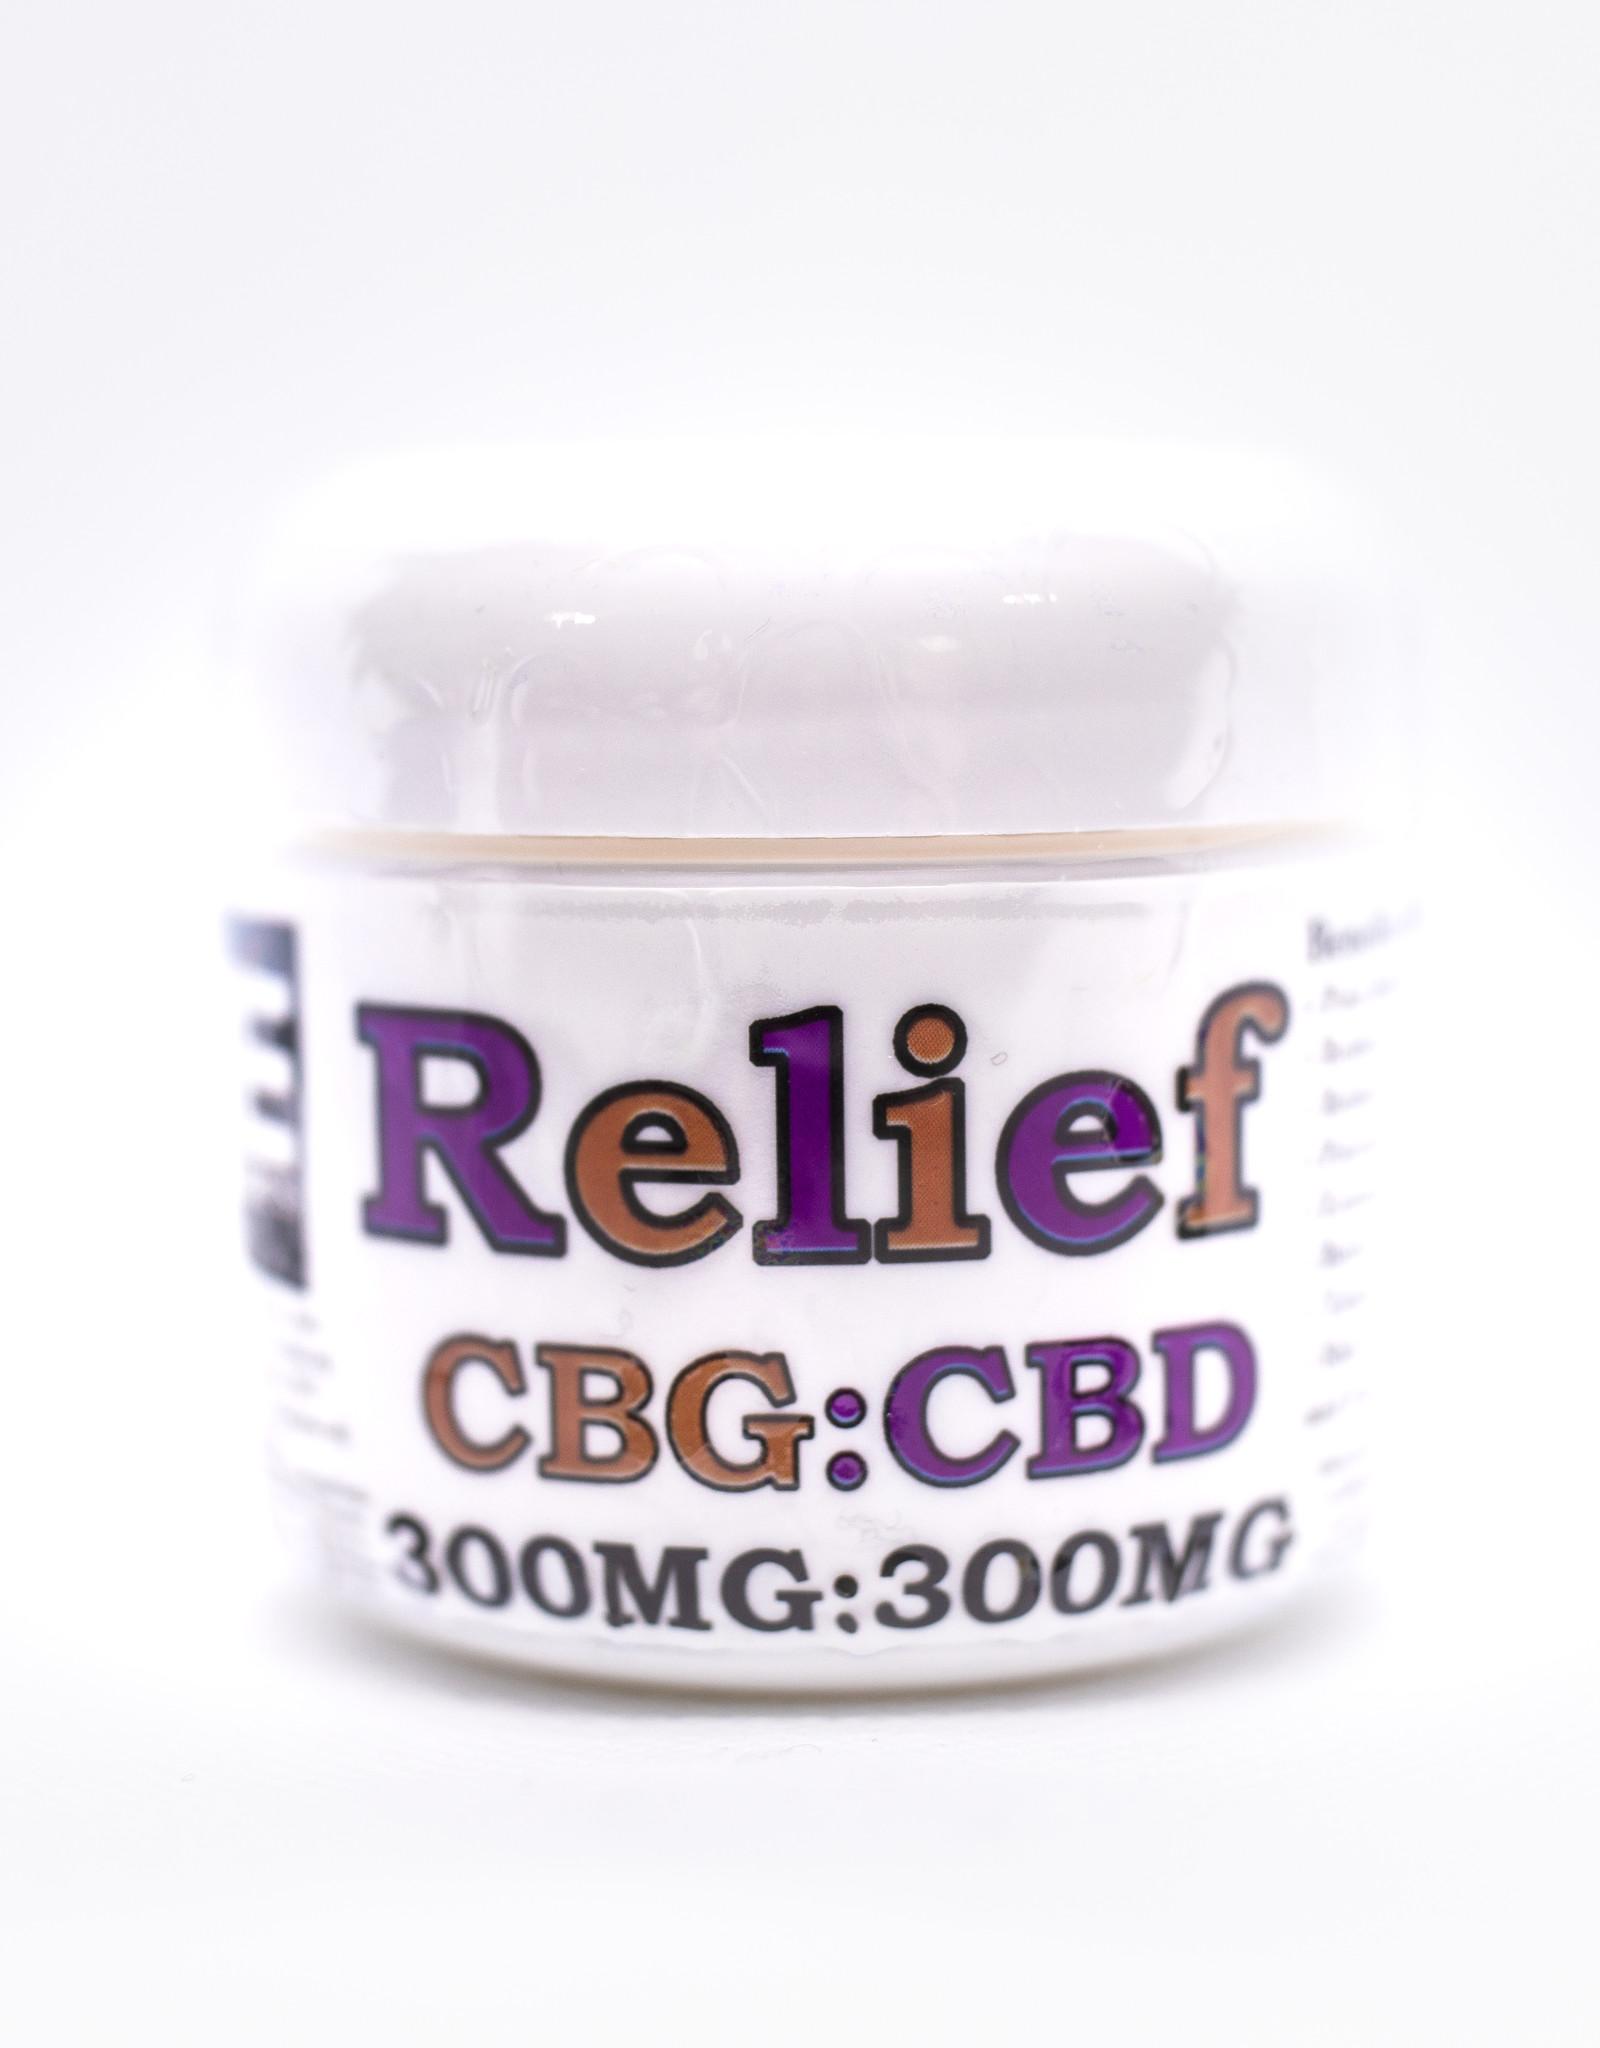 Medie Edie's CBG : CBD - Relief 2oz/300mg:300mg